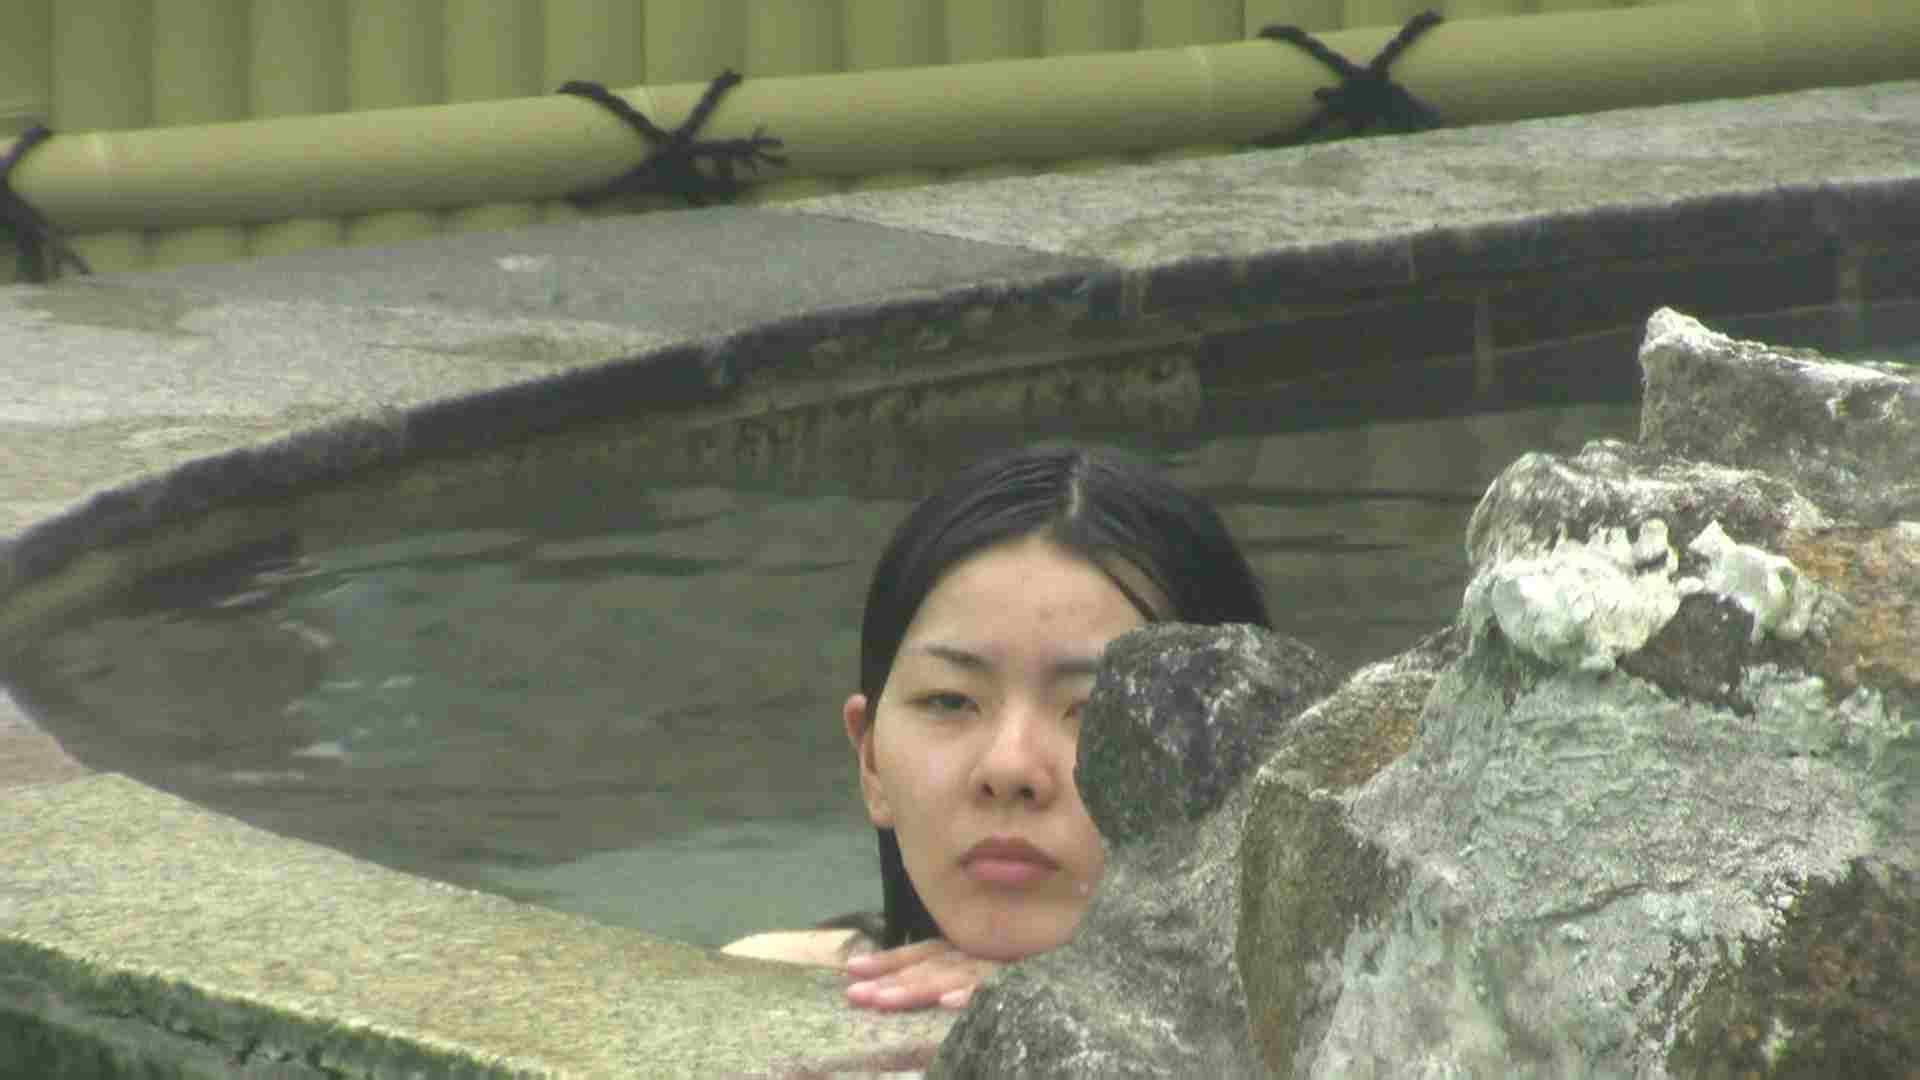 高画質露天女風呂観察 vol.040 望遠映像 すけべAV動画紹介 94PIX 41